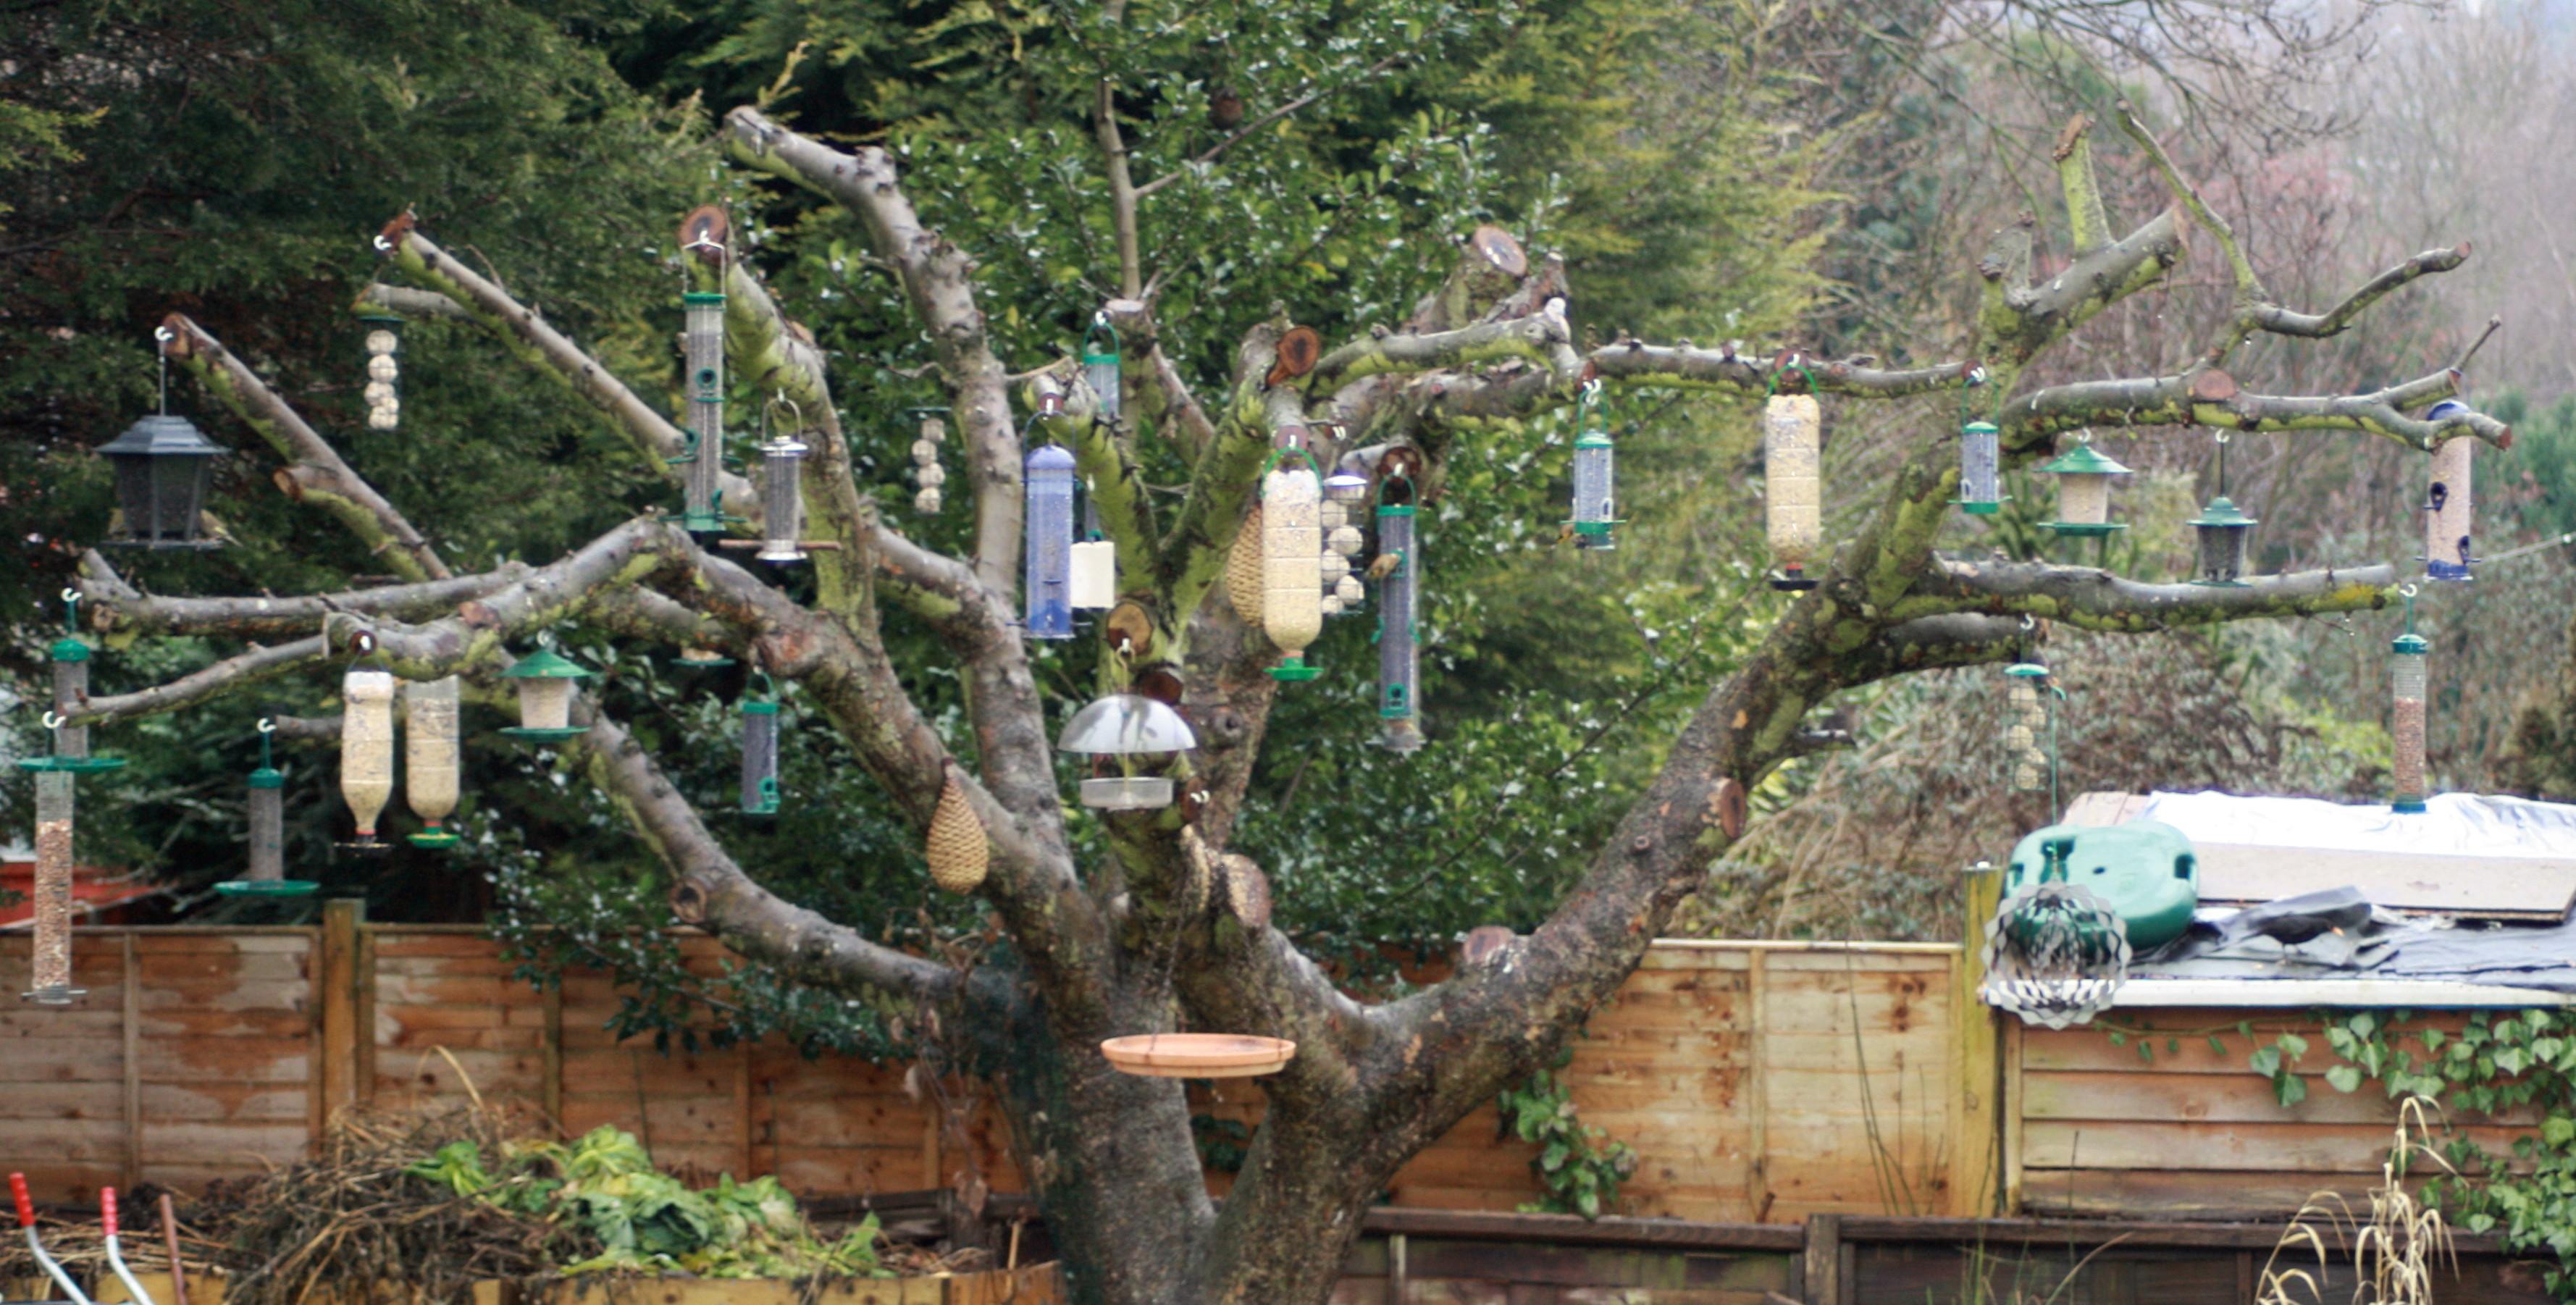 Placement Of Bird Feeders Wildlife Questions Wildlife